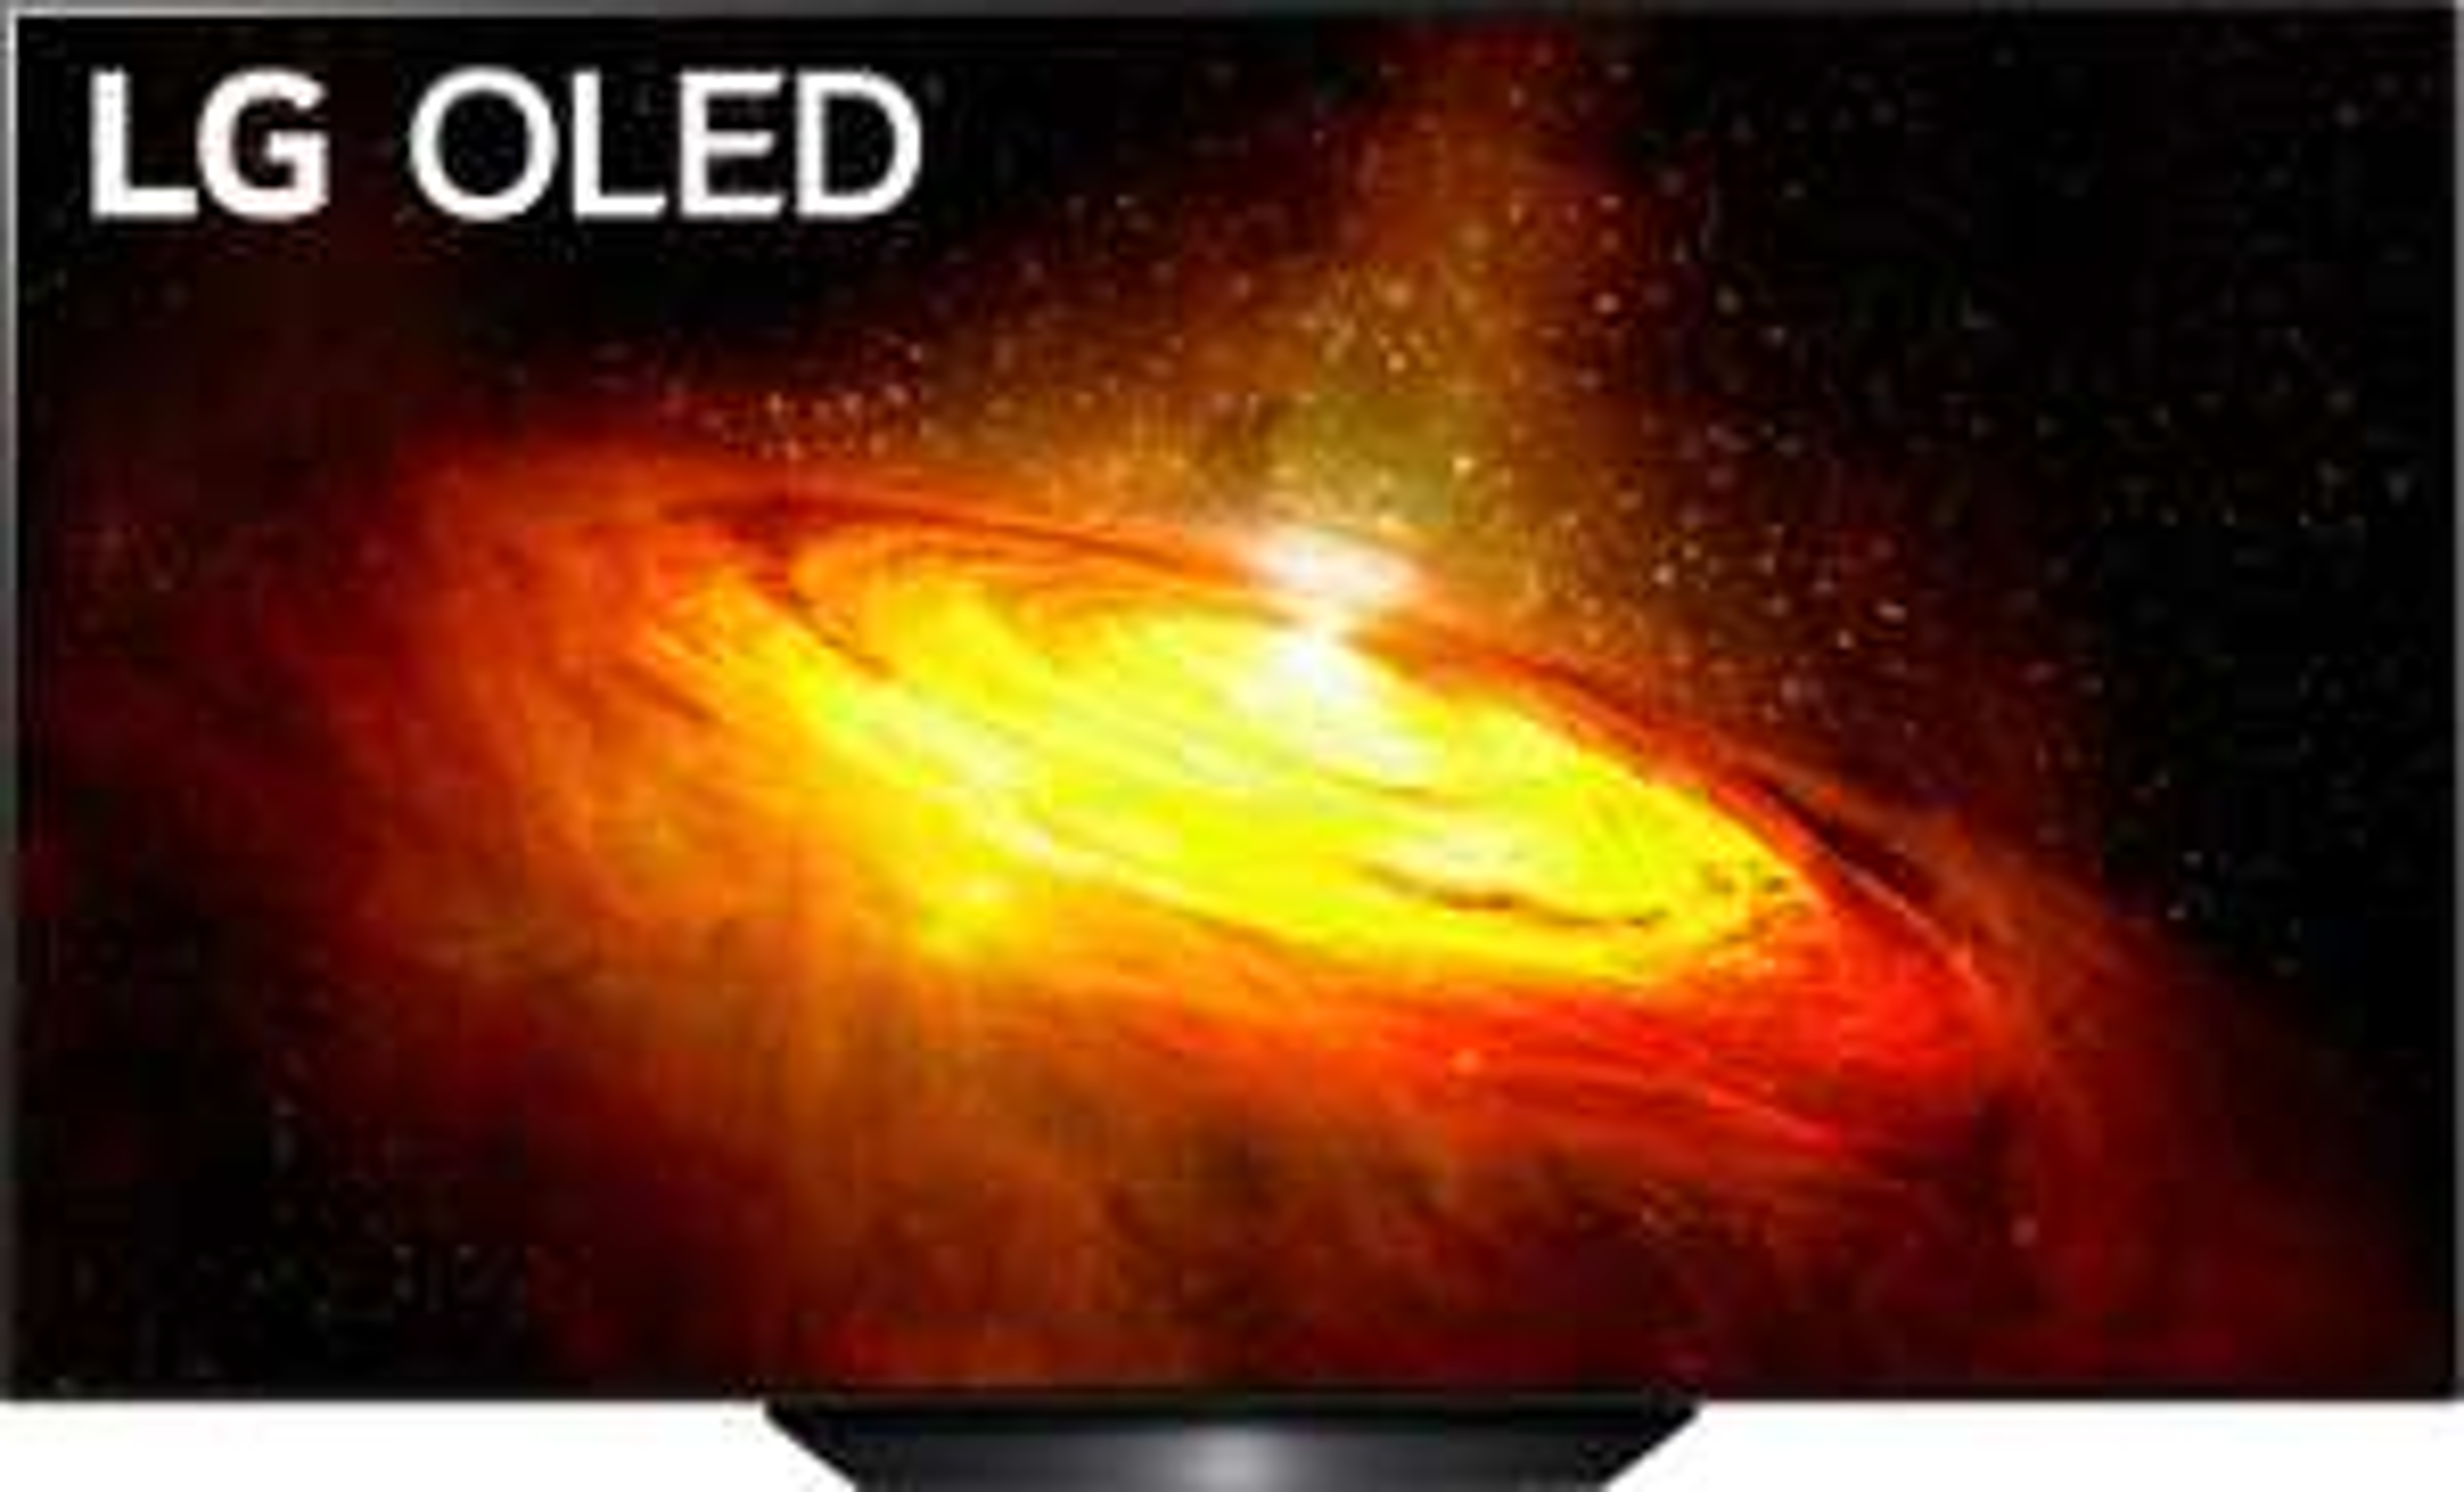 LG OLED BX55 zum Bestpreis seit Black Friday